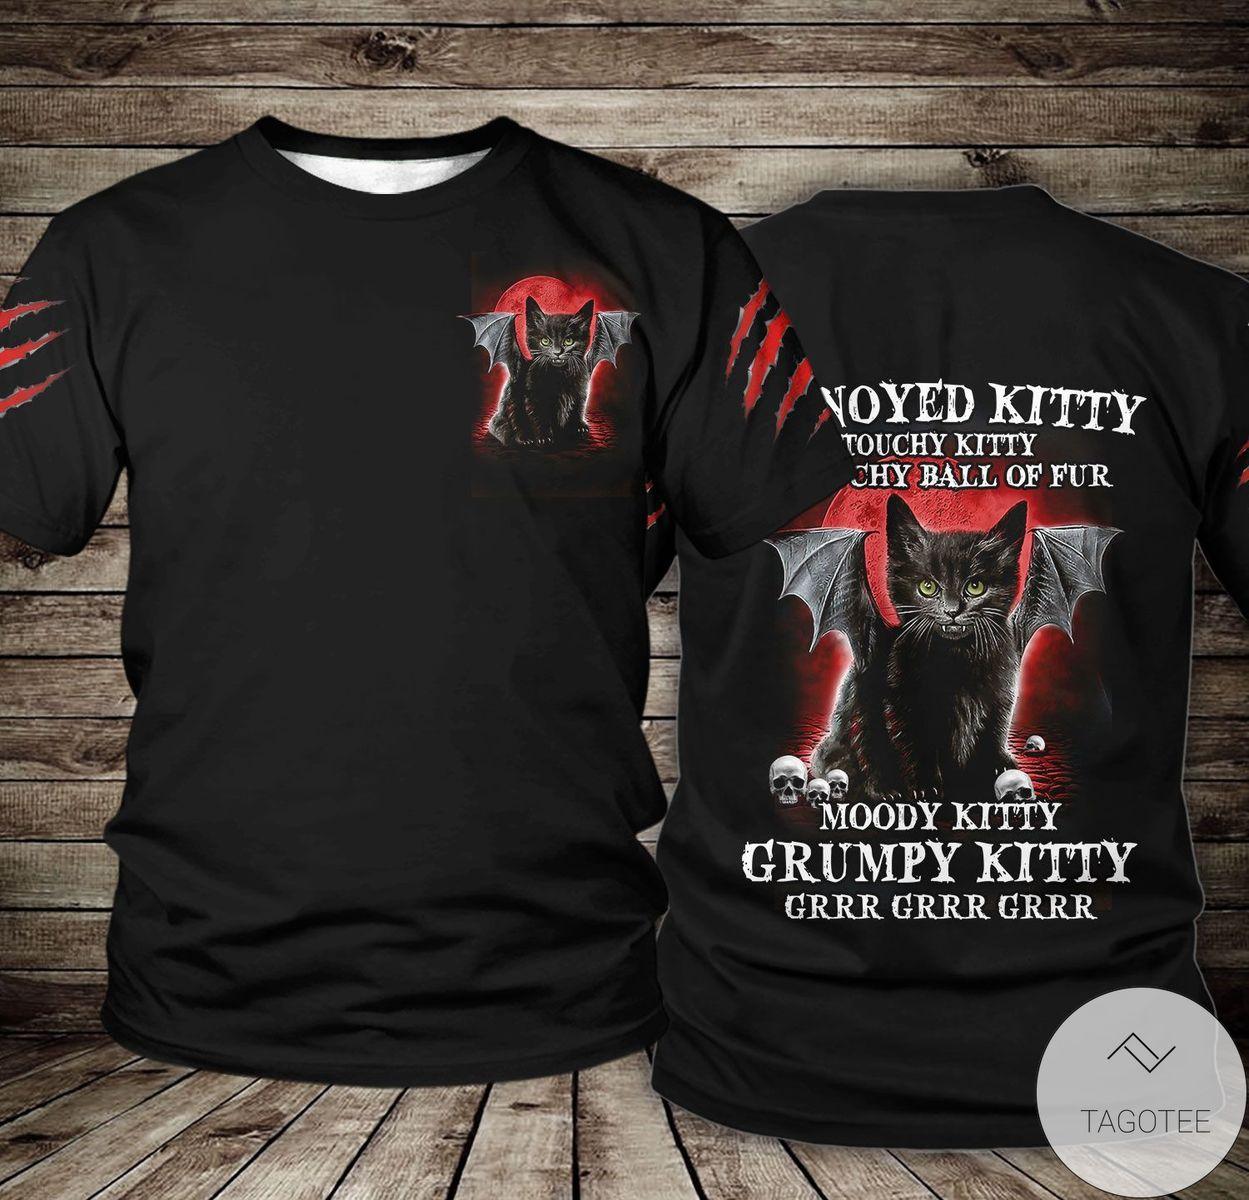 Hot Annoyed Kitty Touchy Kitty Grouchy Ball Of Fur Halloween 3D T-shirt